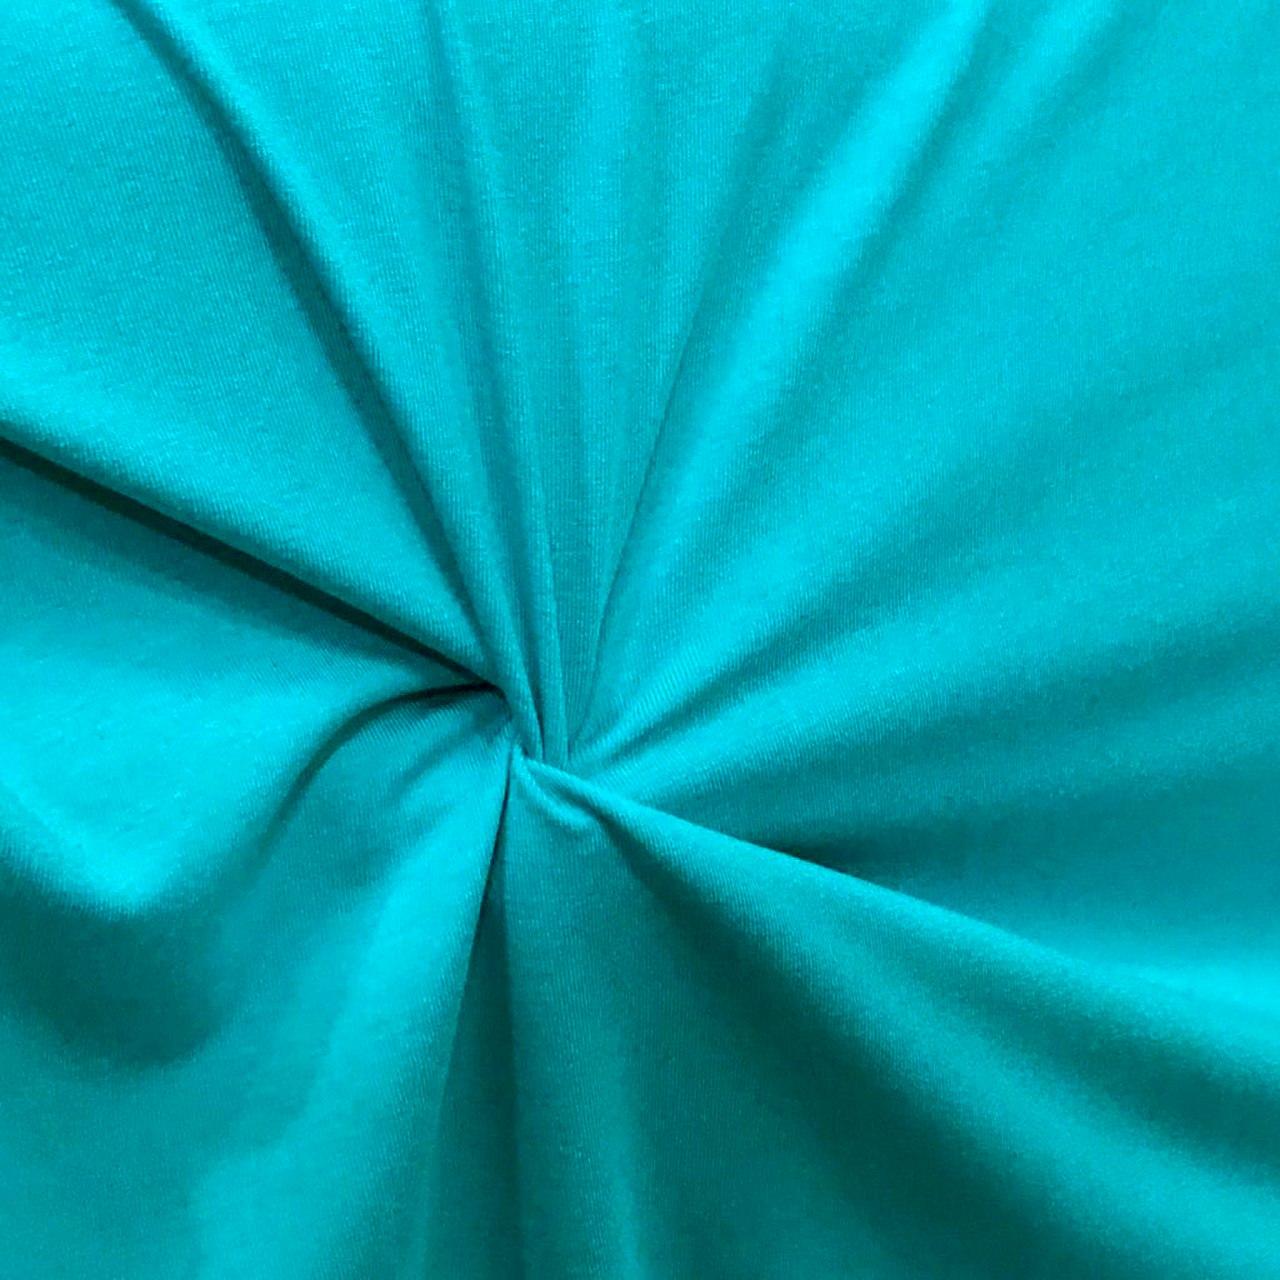 Tecido Malha Viscolycra  92%Viscose 8%Elastano Jade